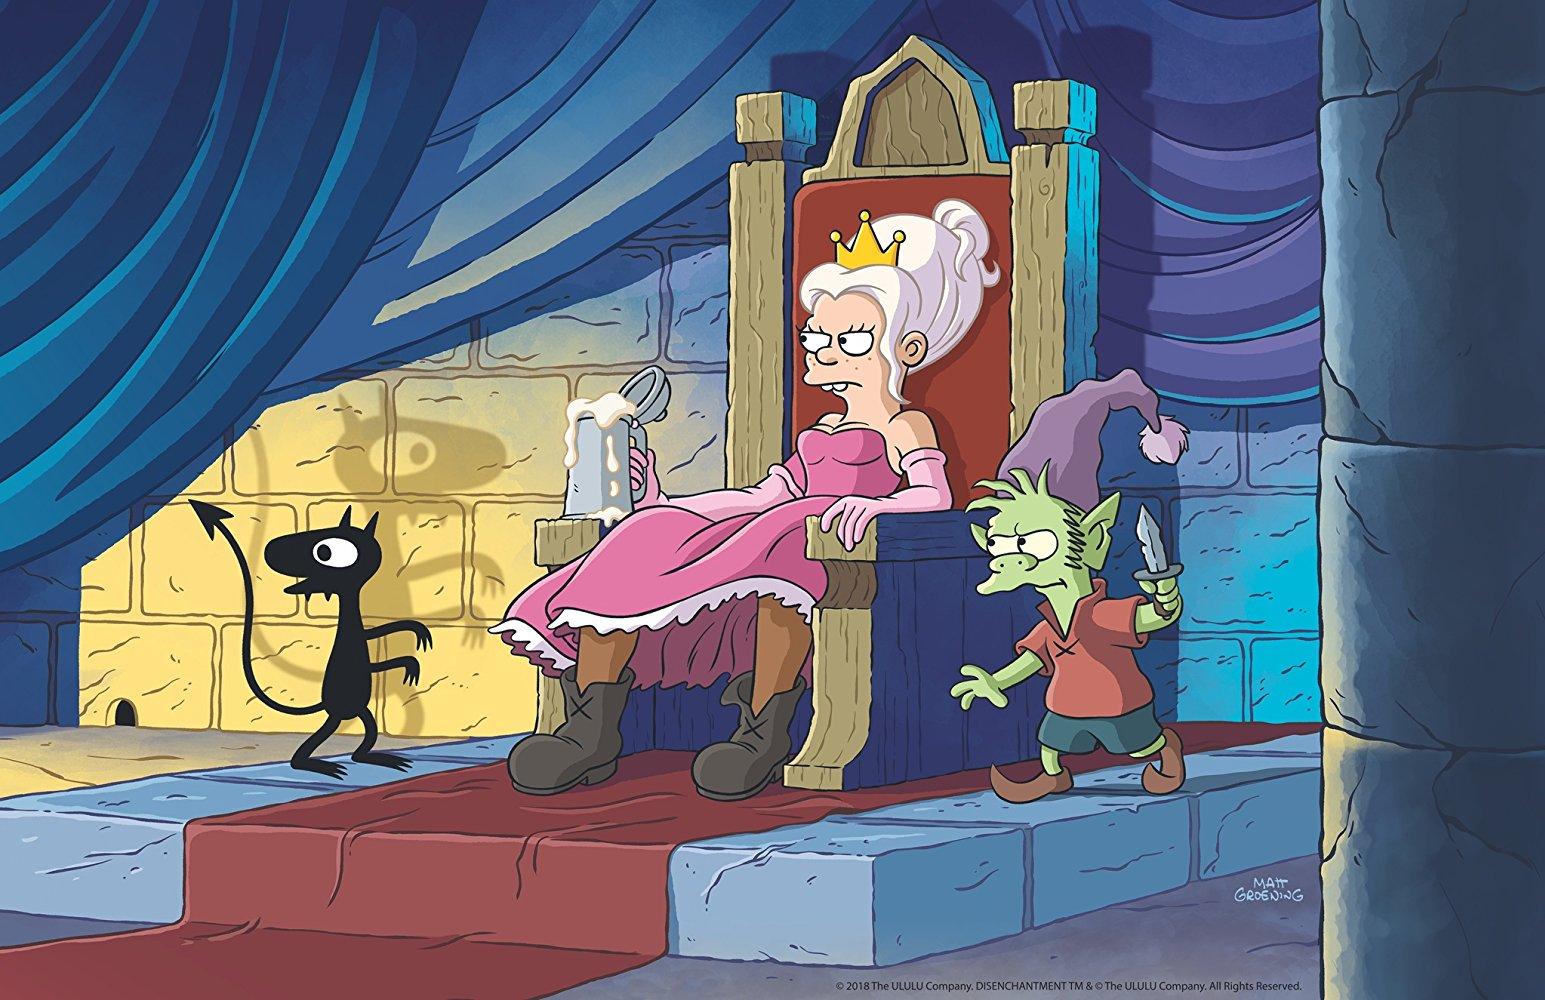 Primer tráiler de '(Des)encanto', la serie de Matt Groening para Netflix